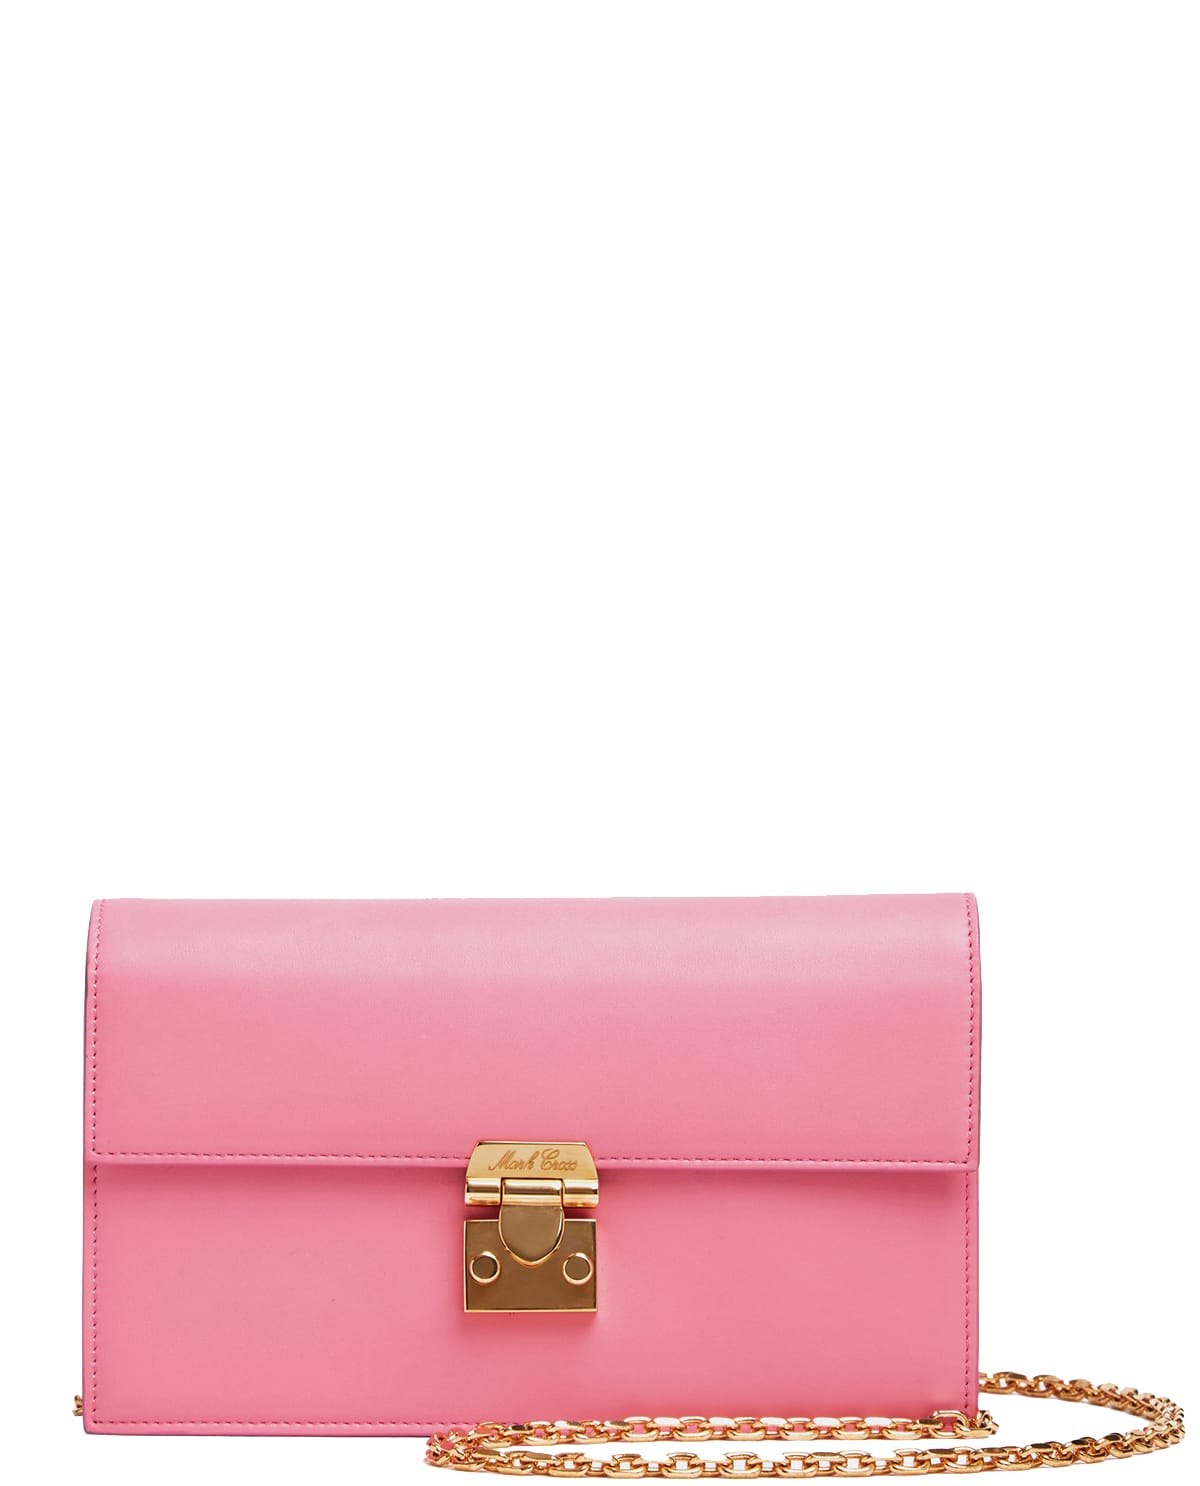 Mark Cross Pink Jacquile Wallet Bag